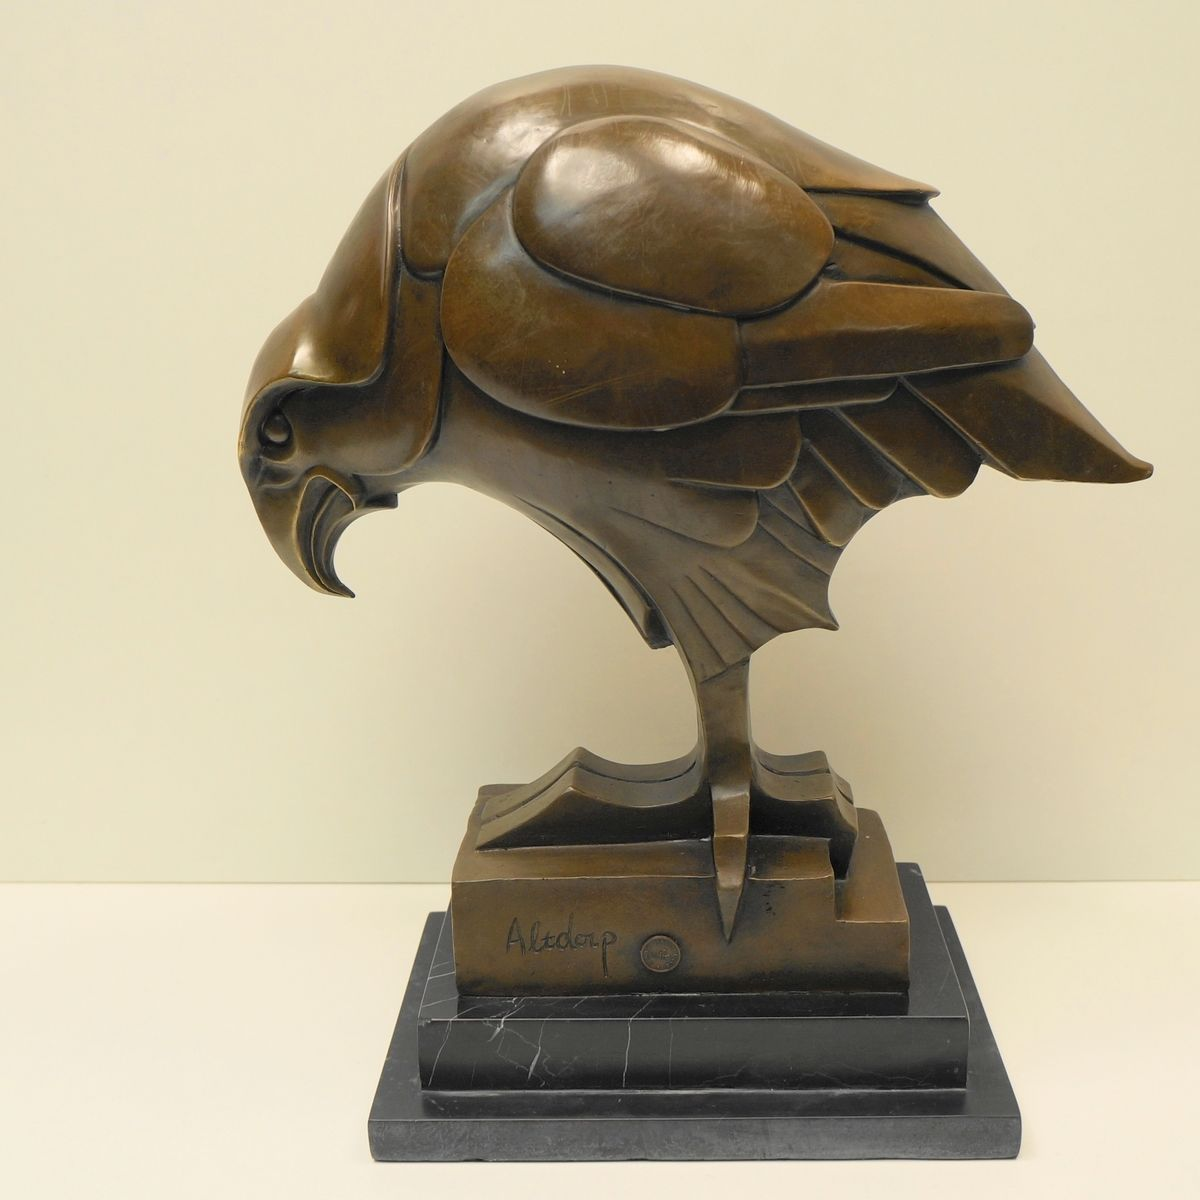 Art fairs mechanical movement metal paris russia sculptures wood - Statue Sculpture Eagle Bird Wildlife Art Deco Style Art Nouveau Style Bronze Sig